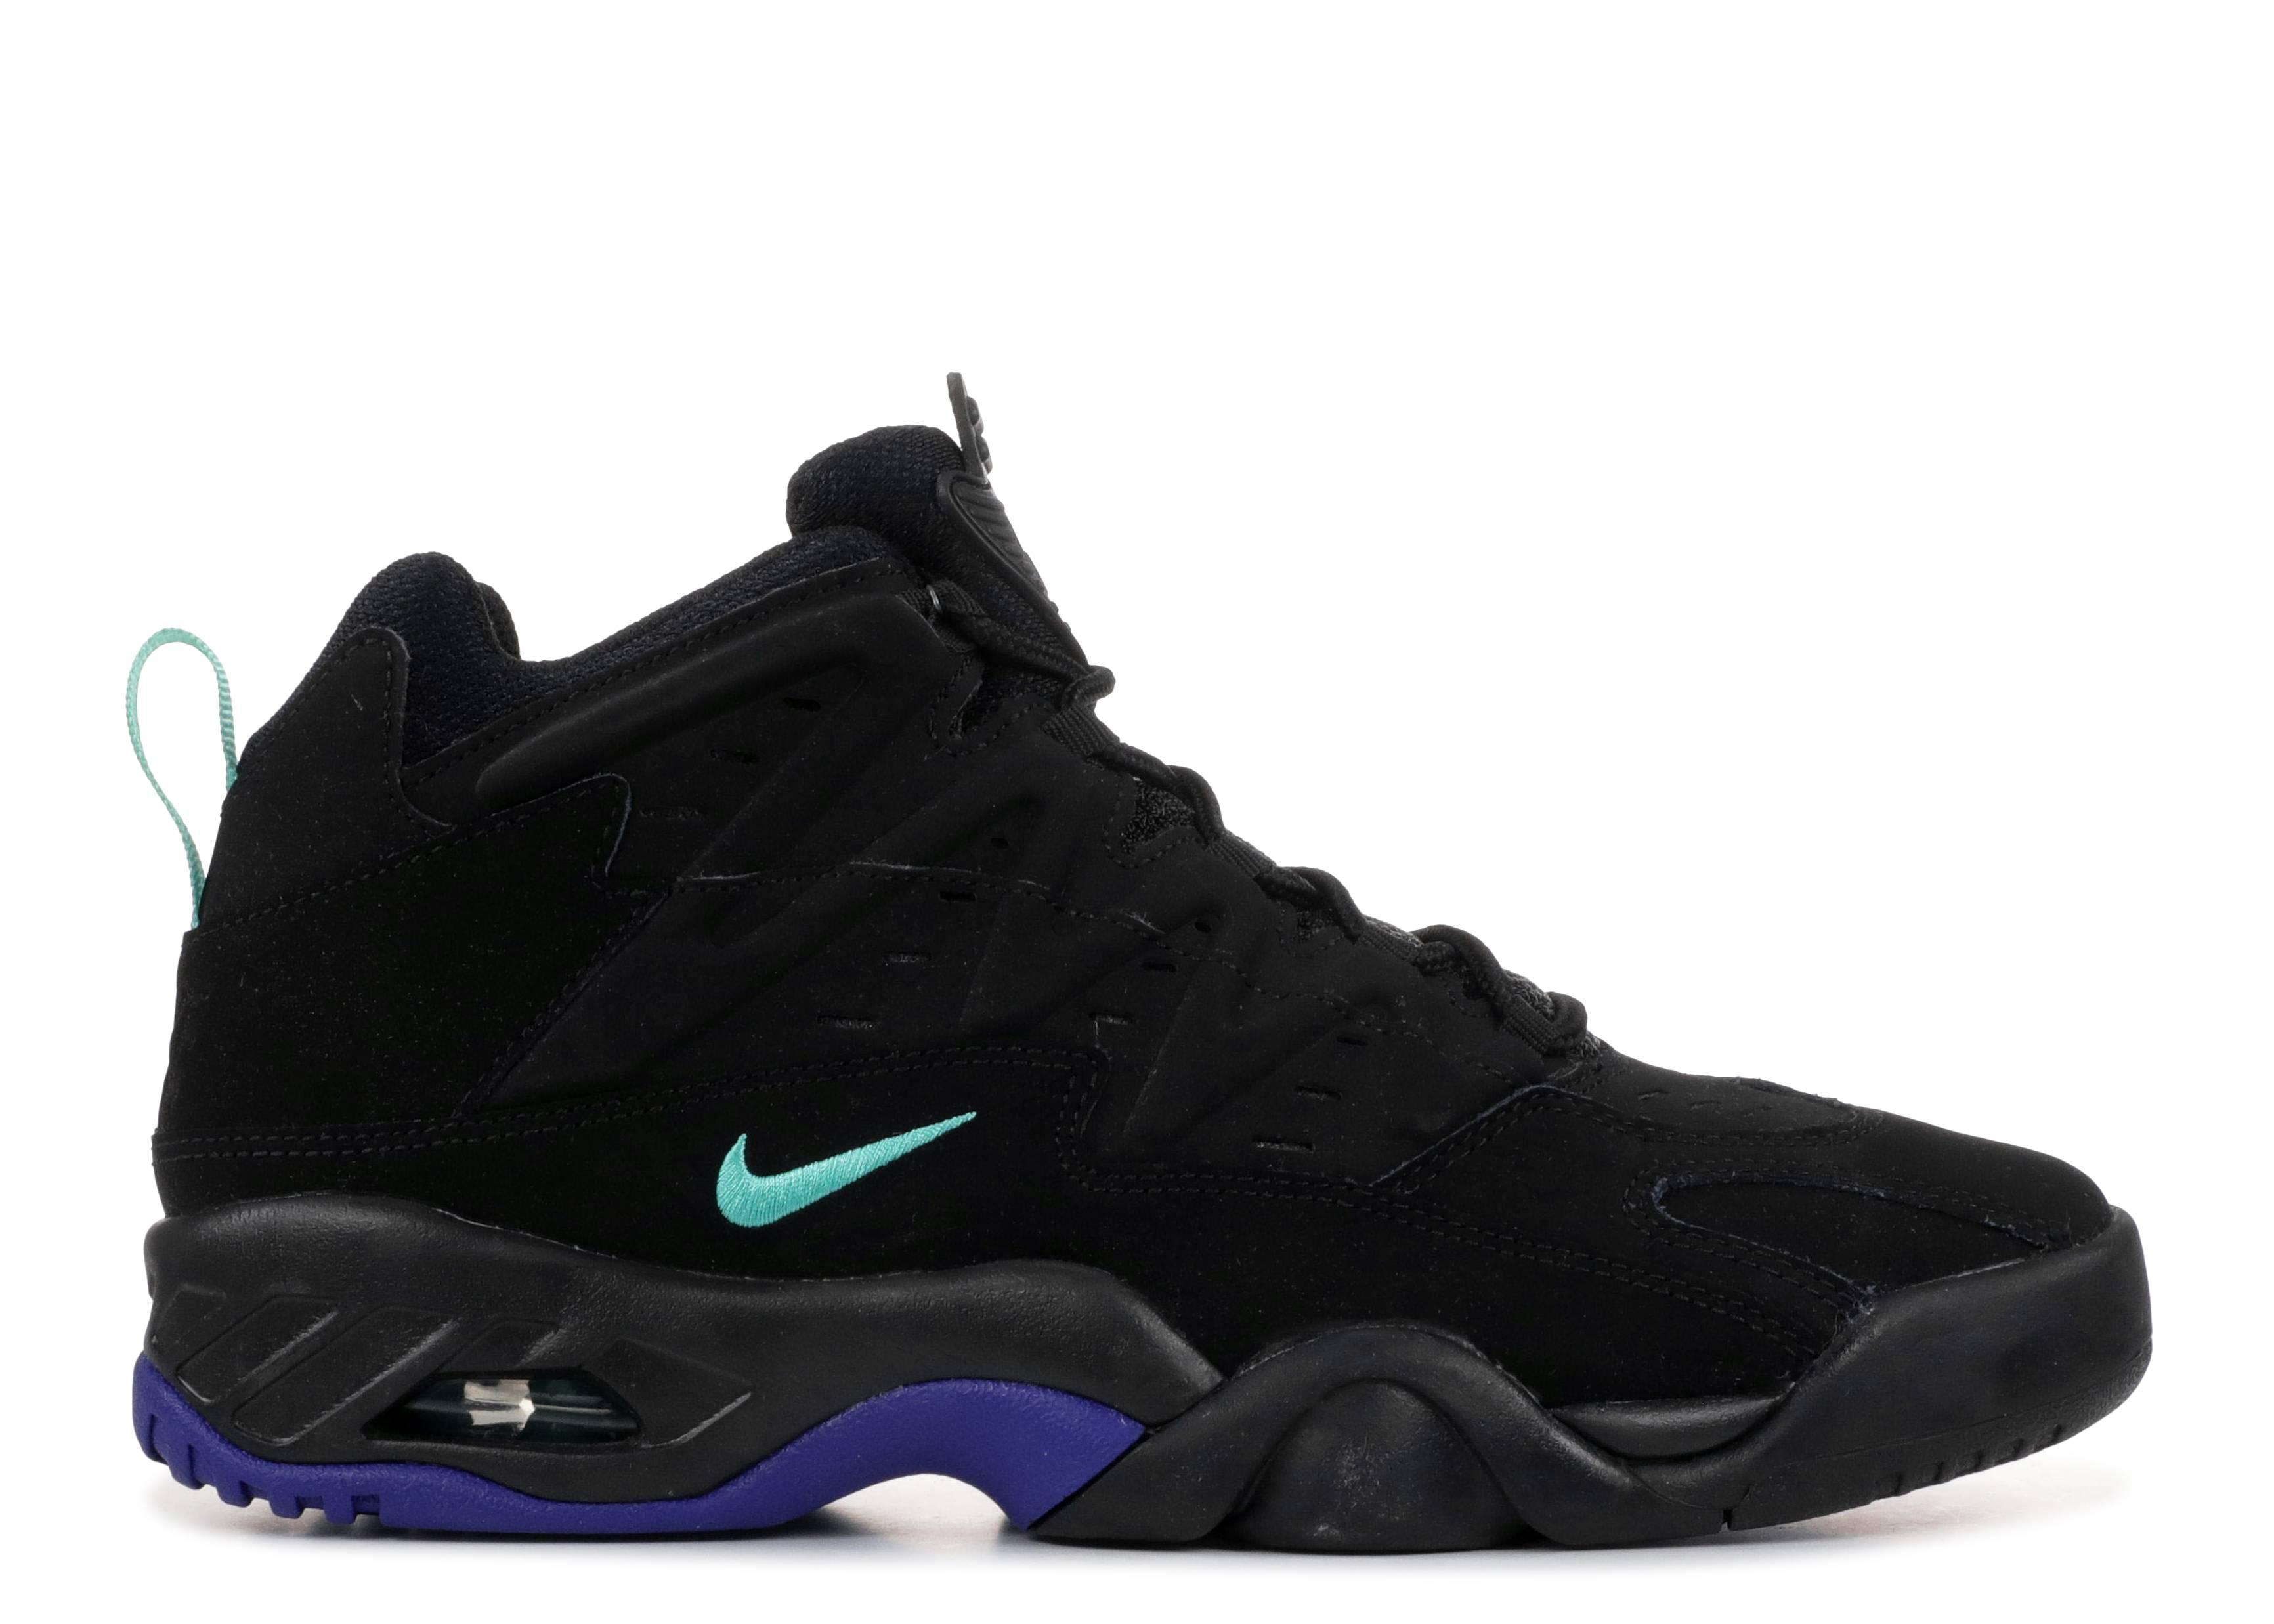 fffbc5391e34 Nike Air Flare - Nike - 705438 001 - black lt retro -persain violet ...